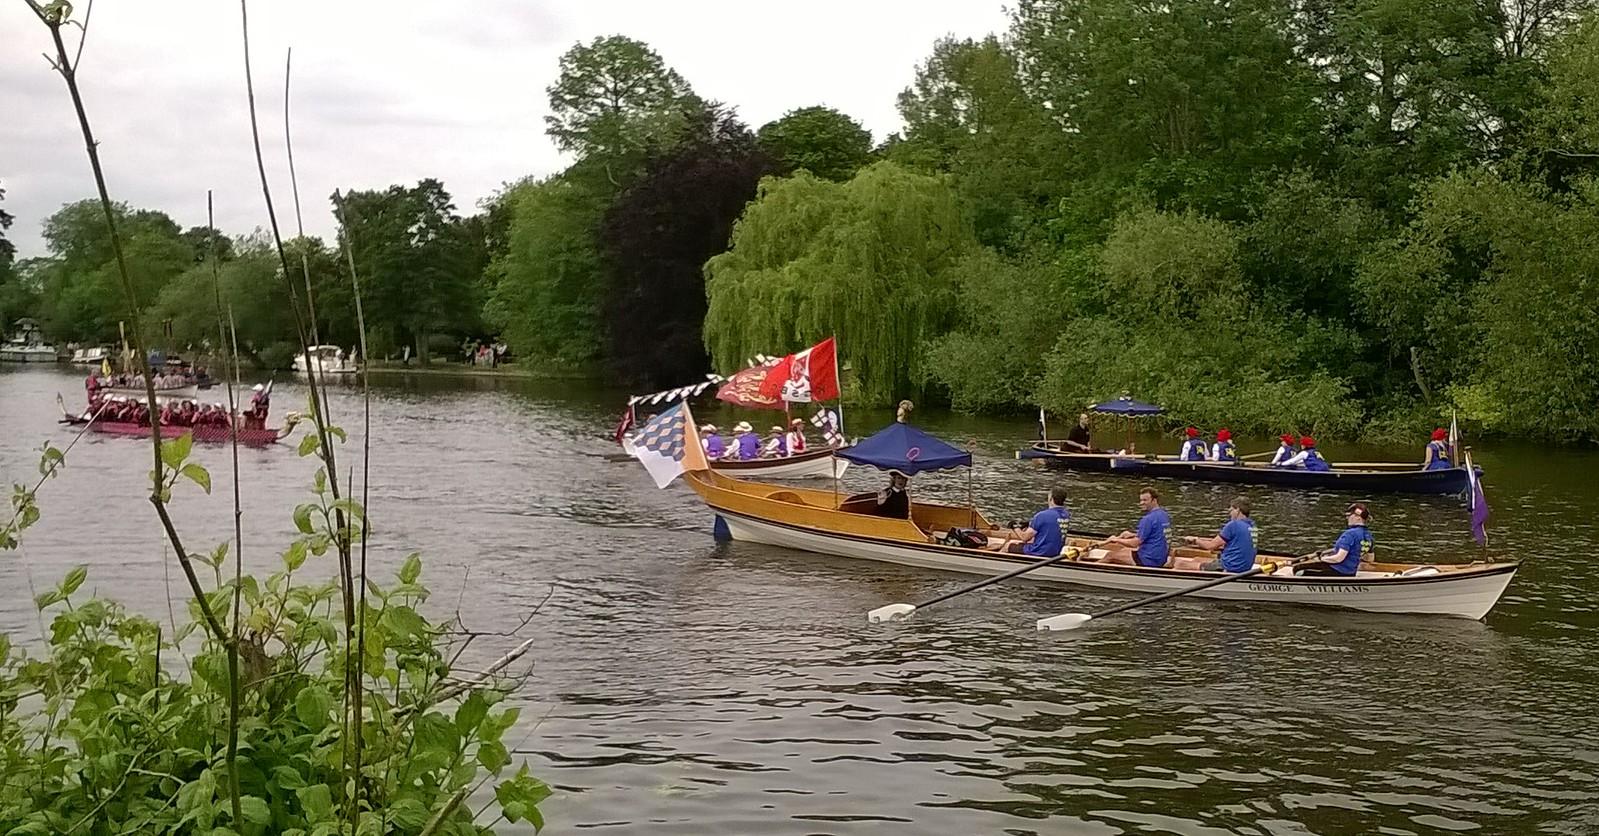 Regatta! 2 Thames, Runnymede